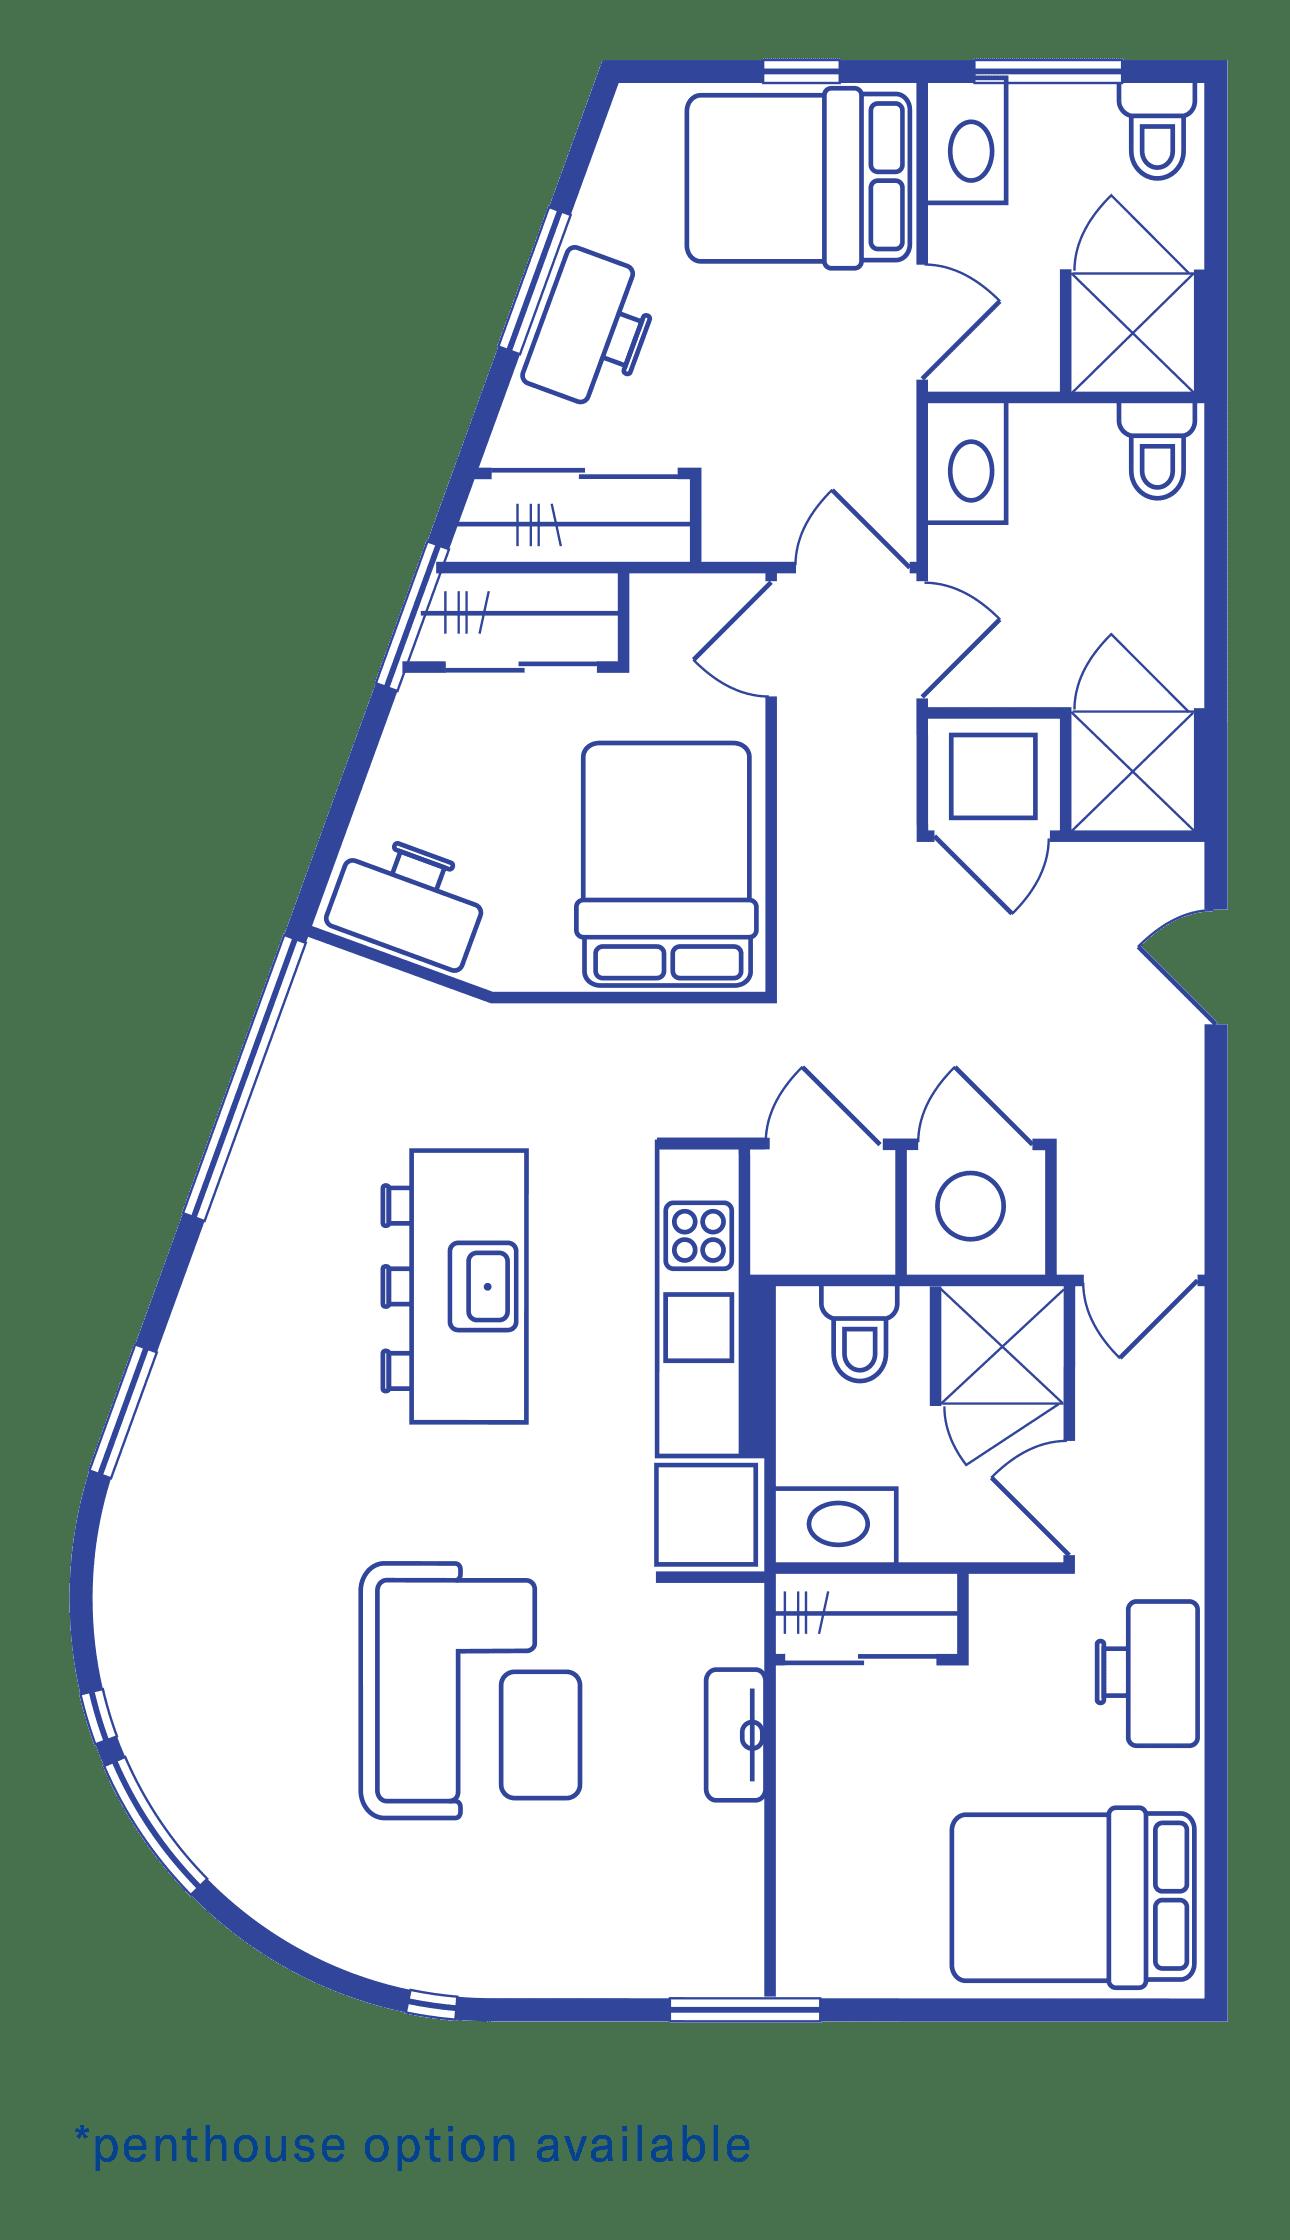 3 Bedroom & 3 Bath Floorplan 1